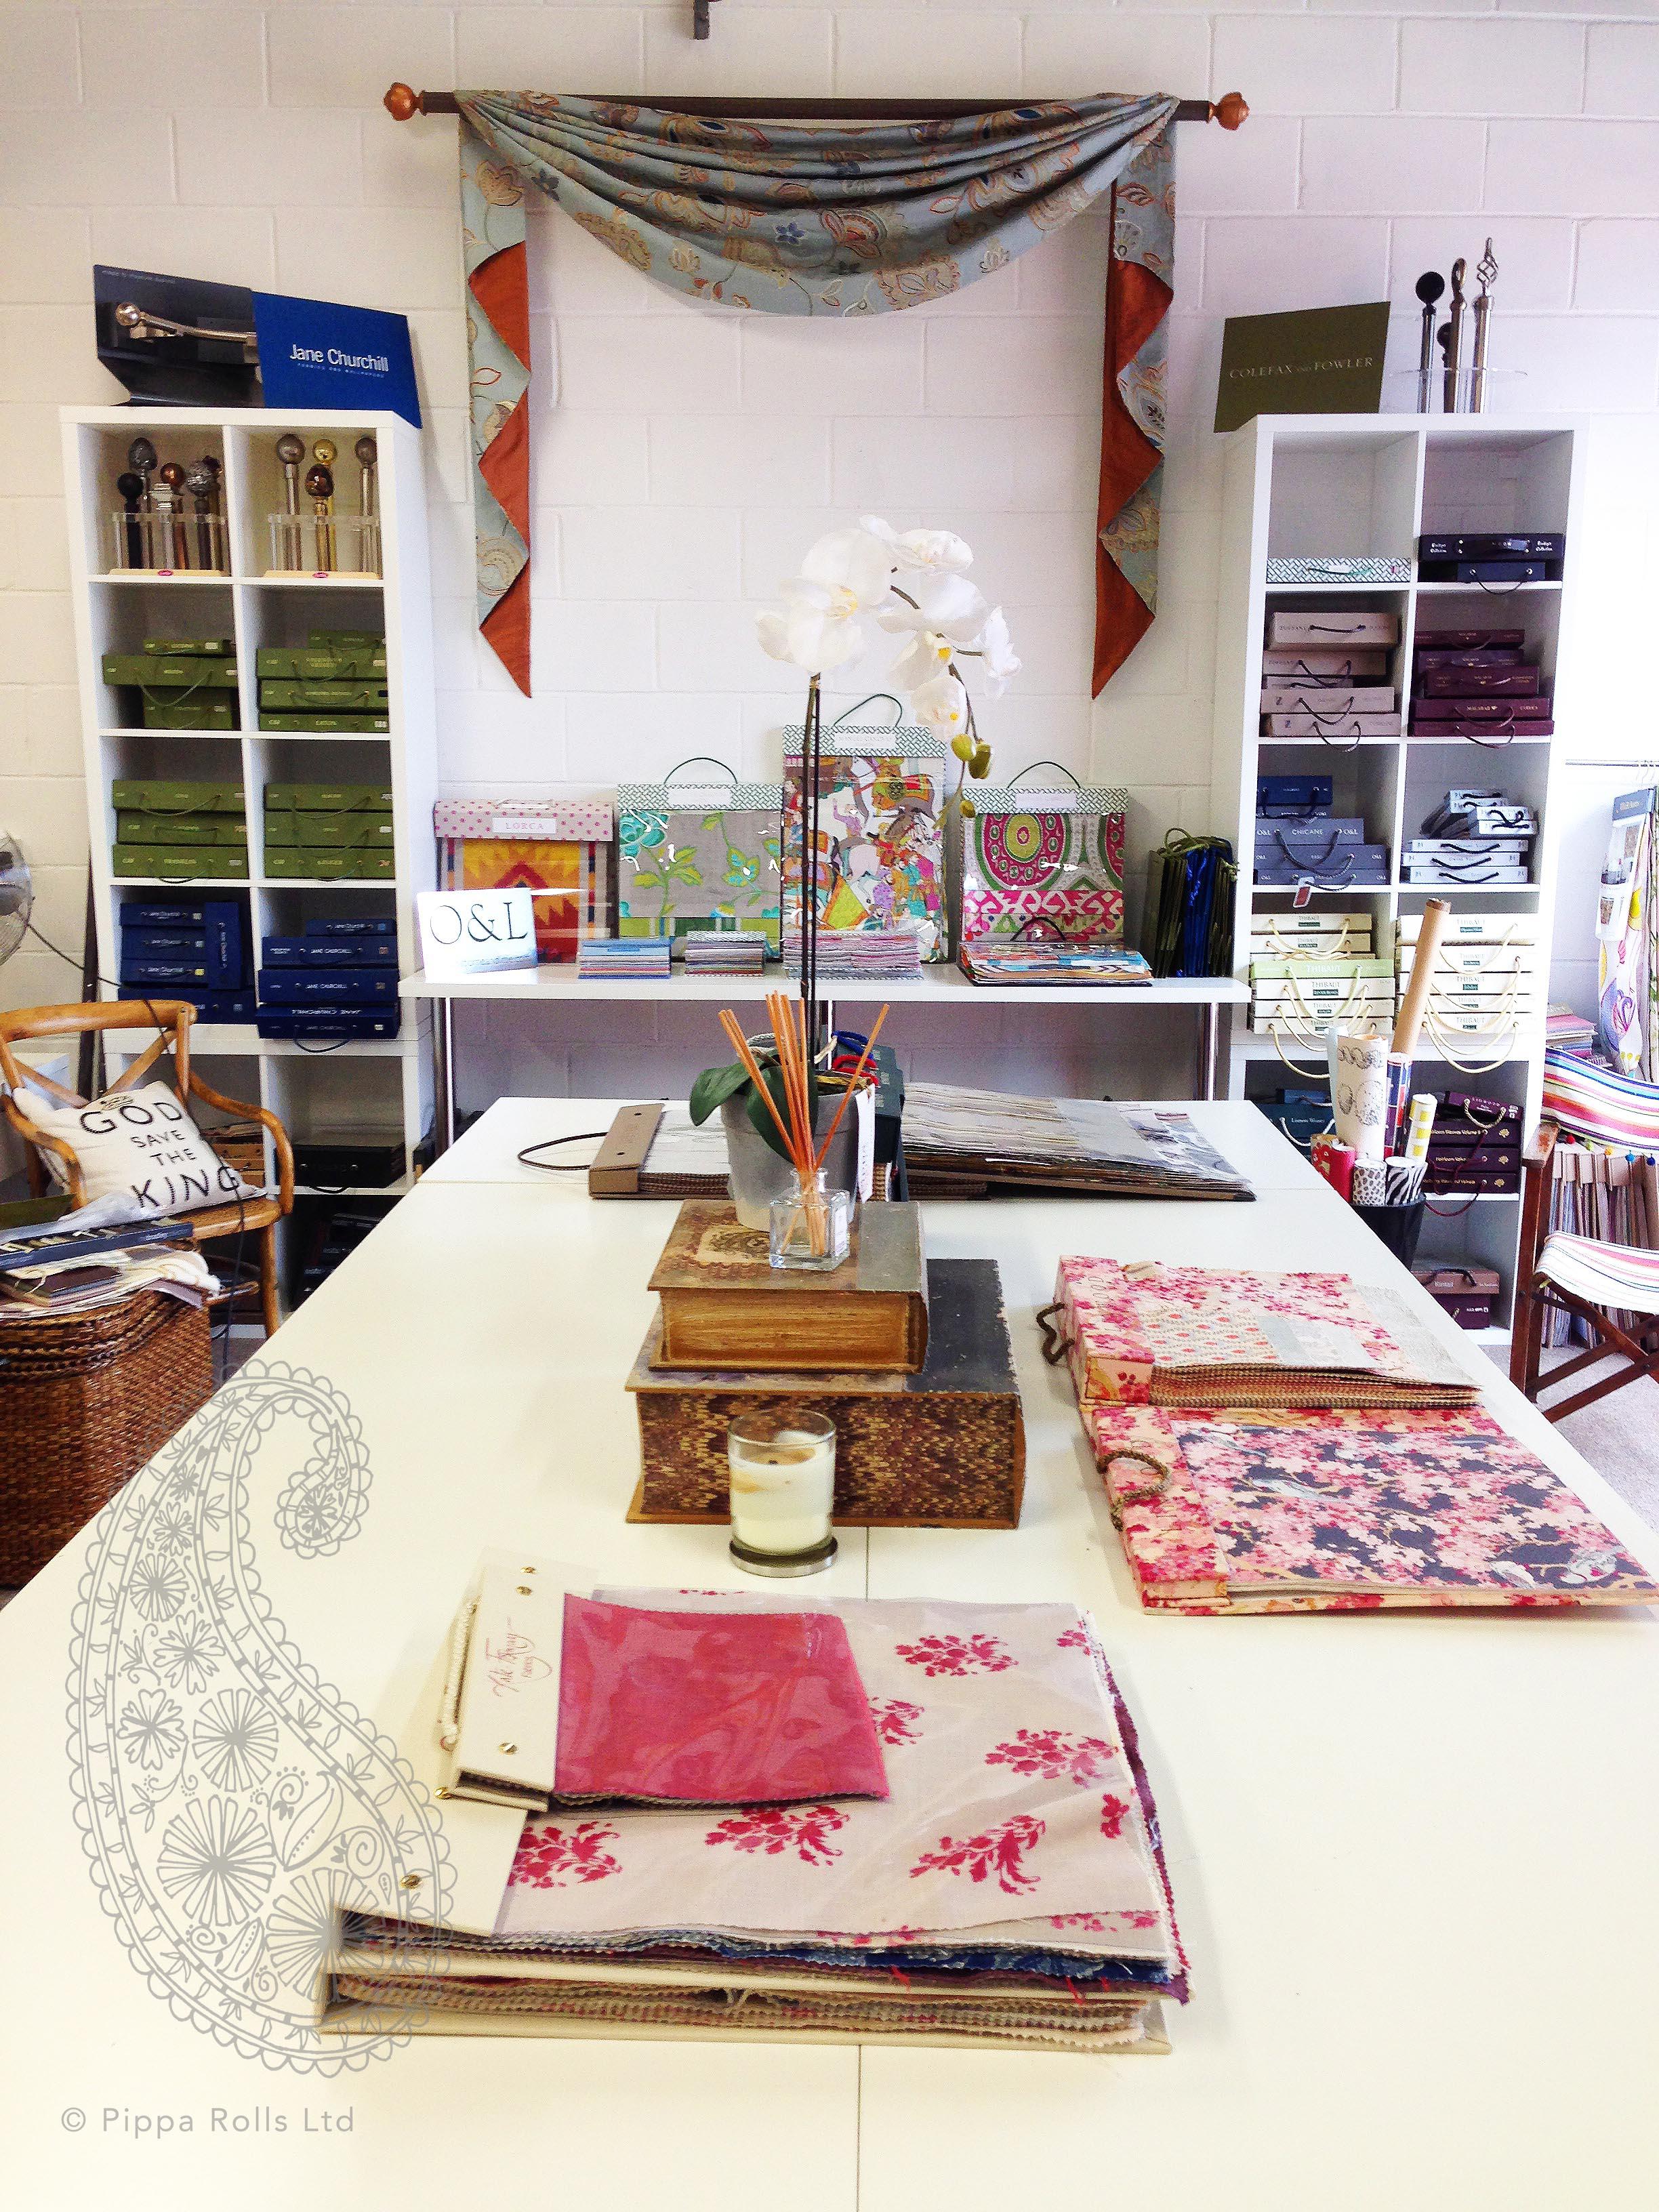 View of workroom Pippa Rolls Limited jpeg copy.jpg